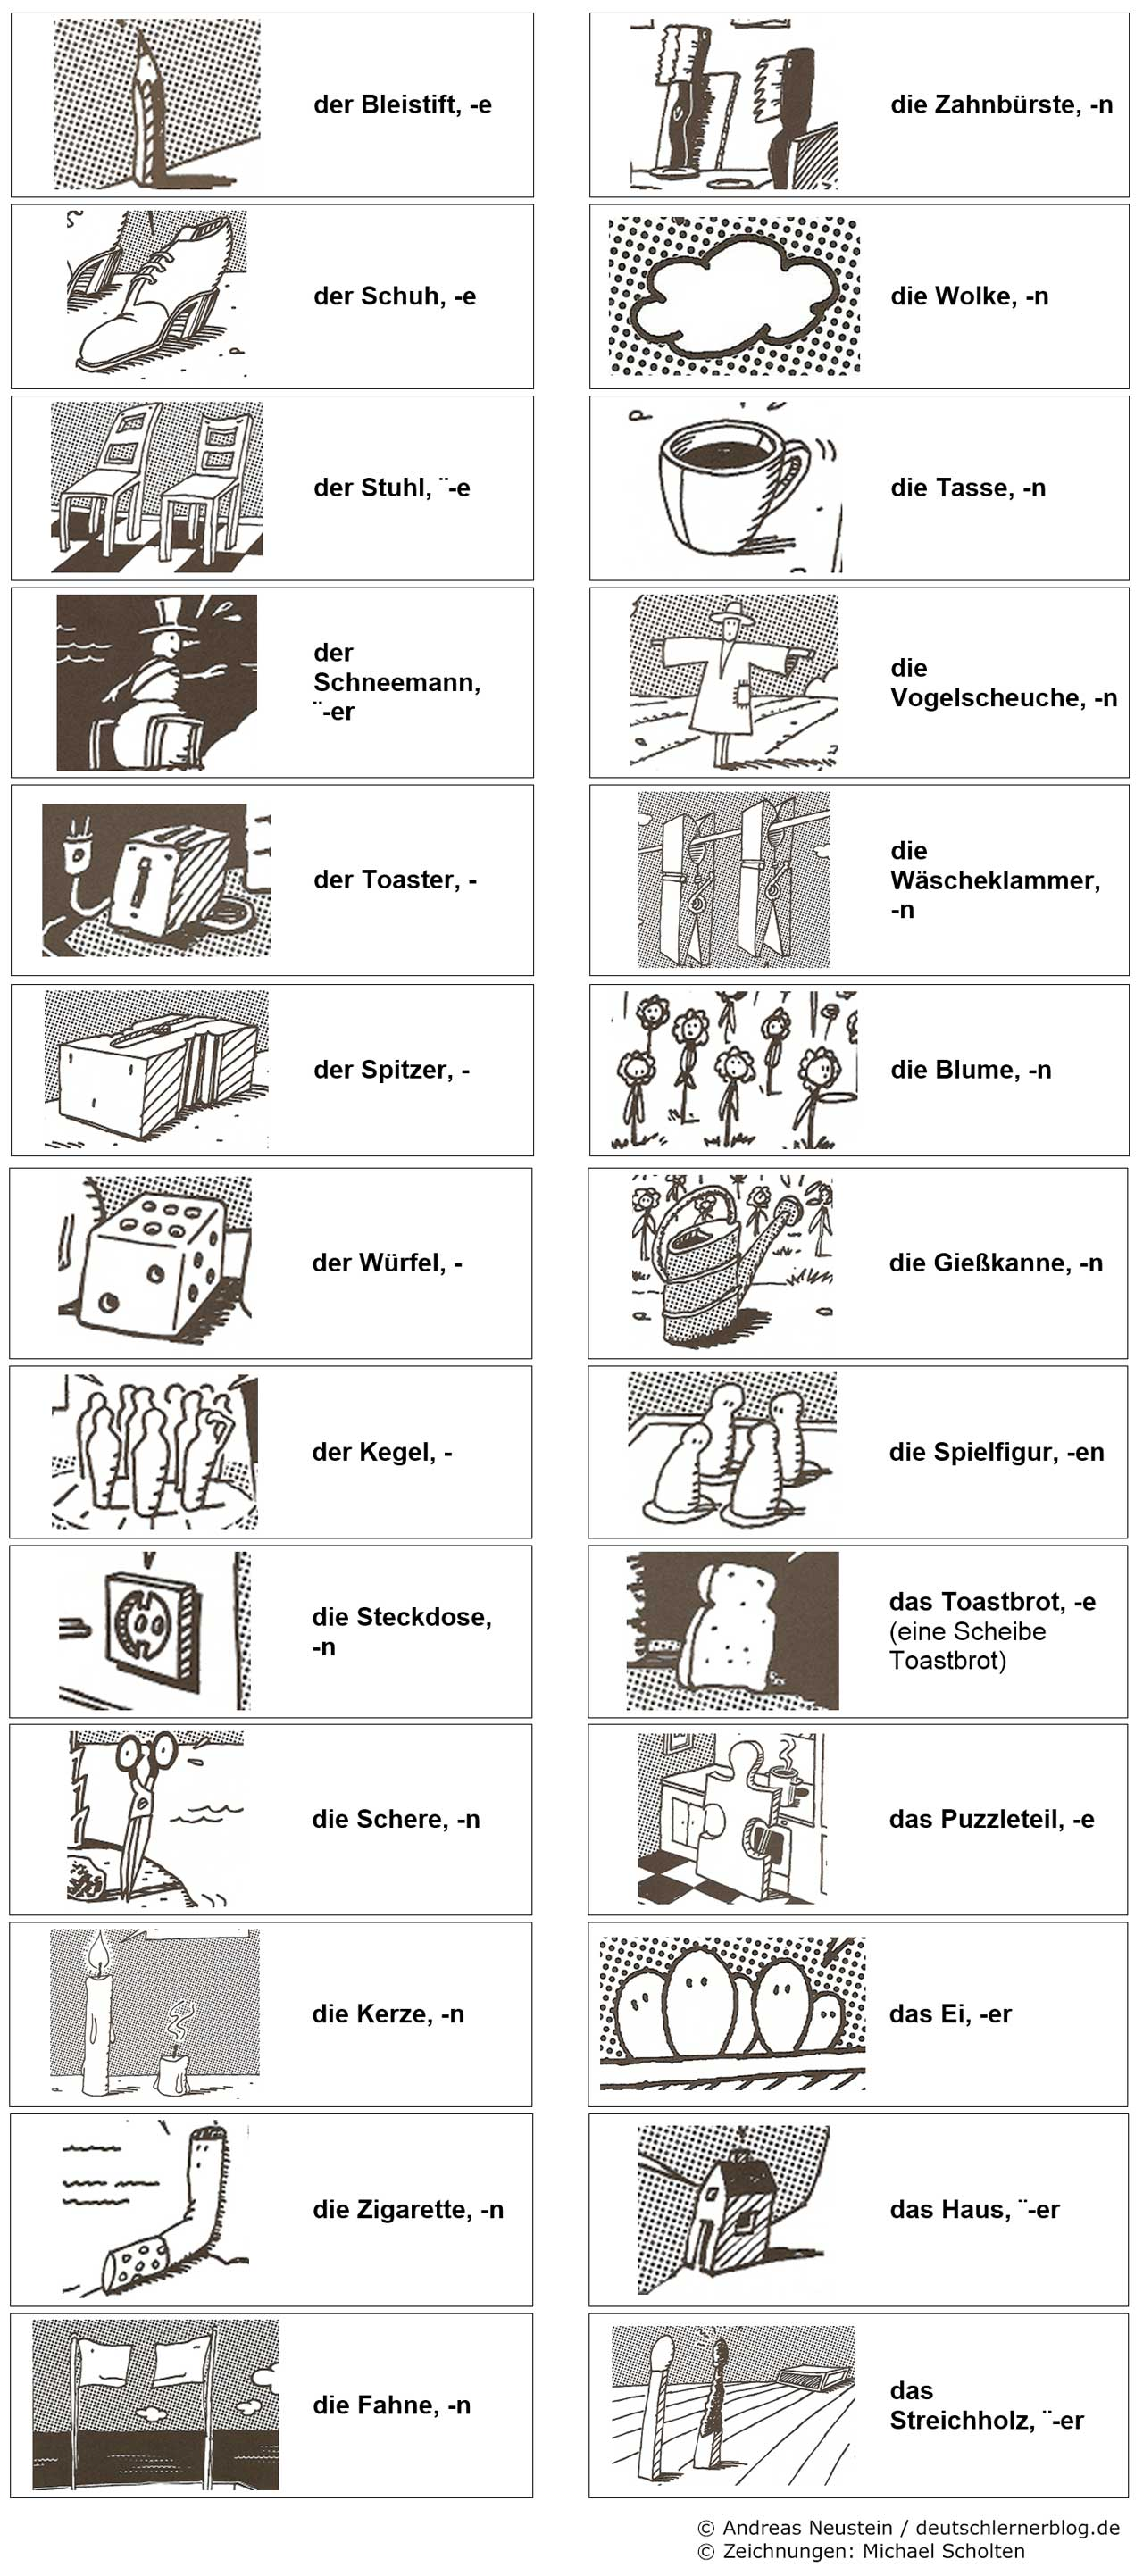 deutsche Cartoons - Wortschatz lernen mit Cartoons - Cartoons michael scholten